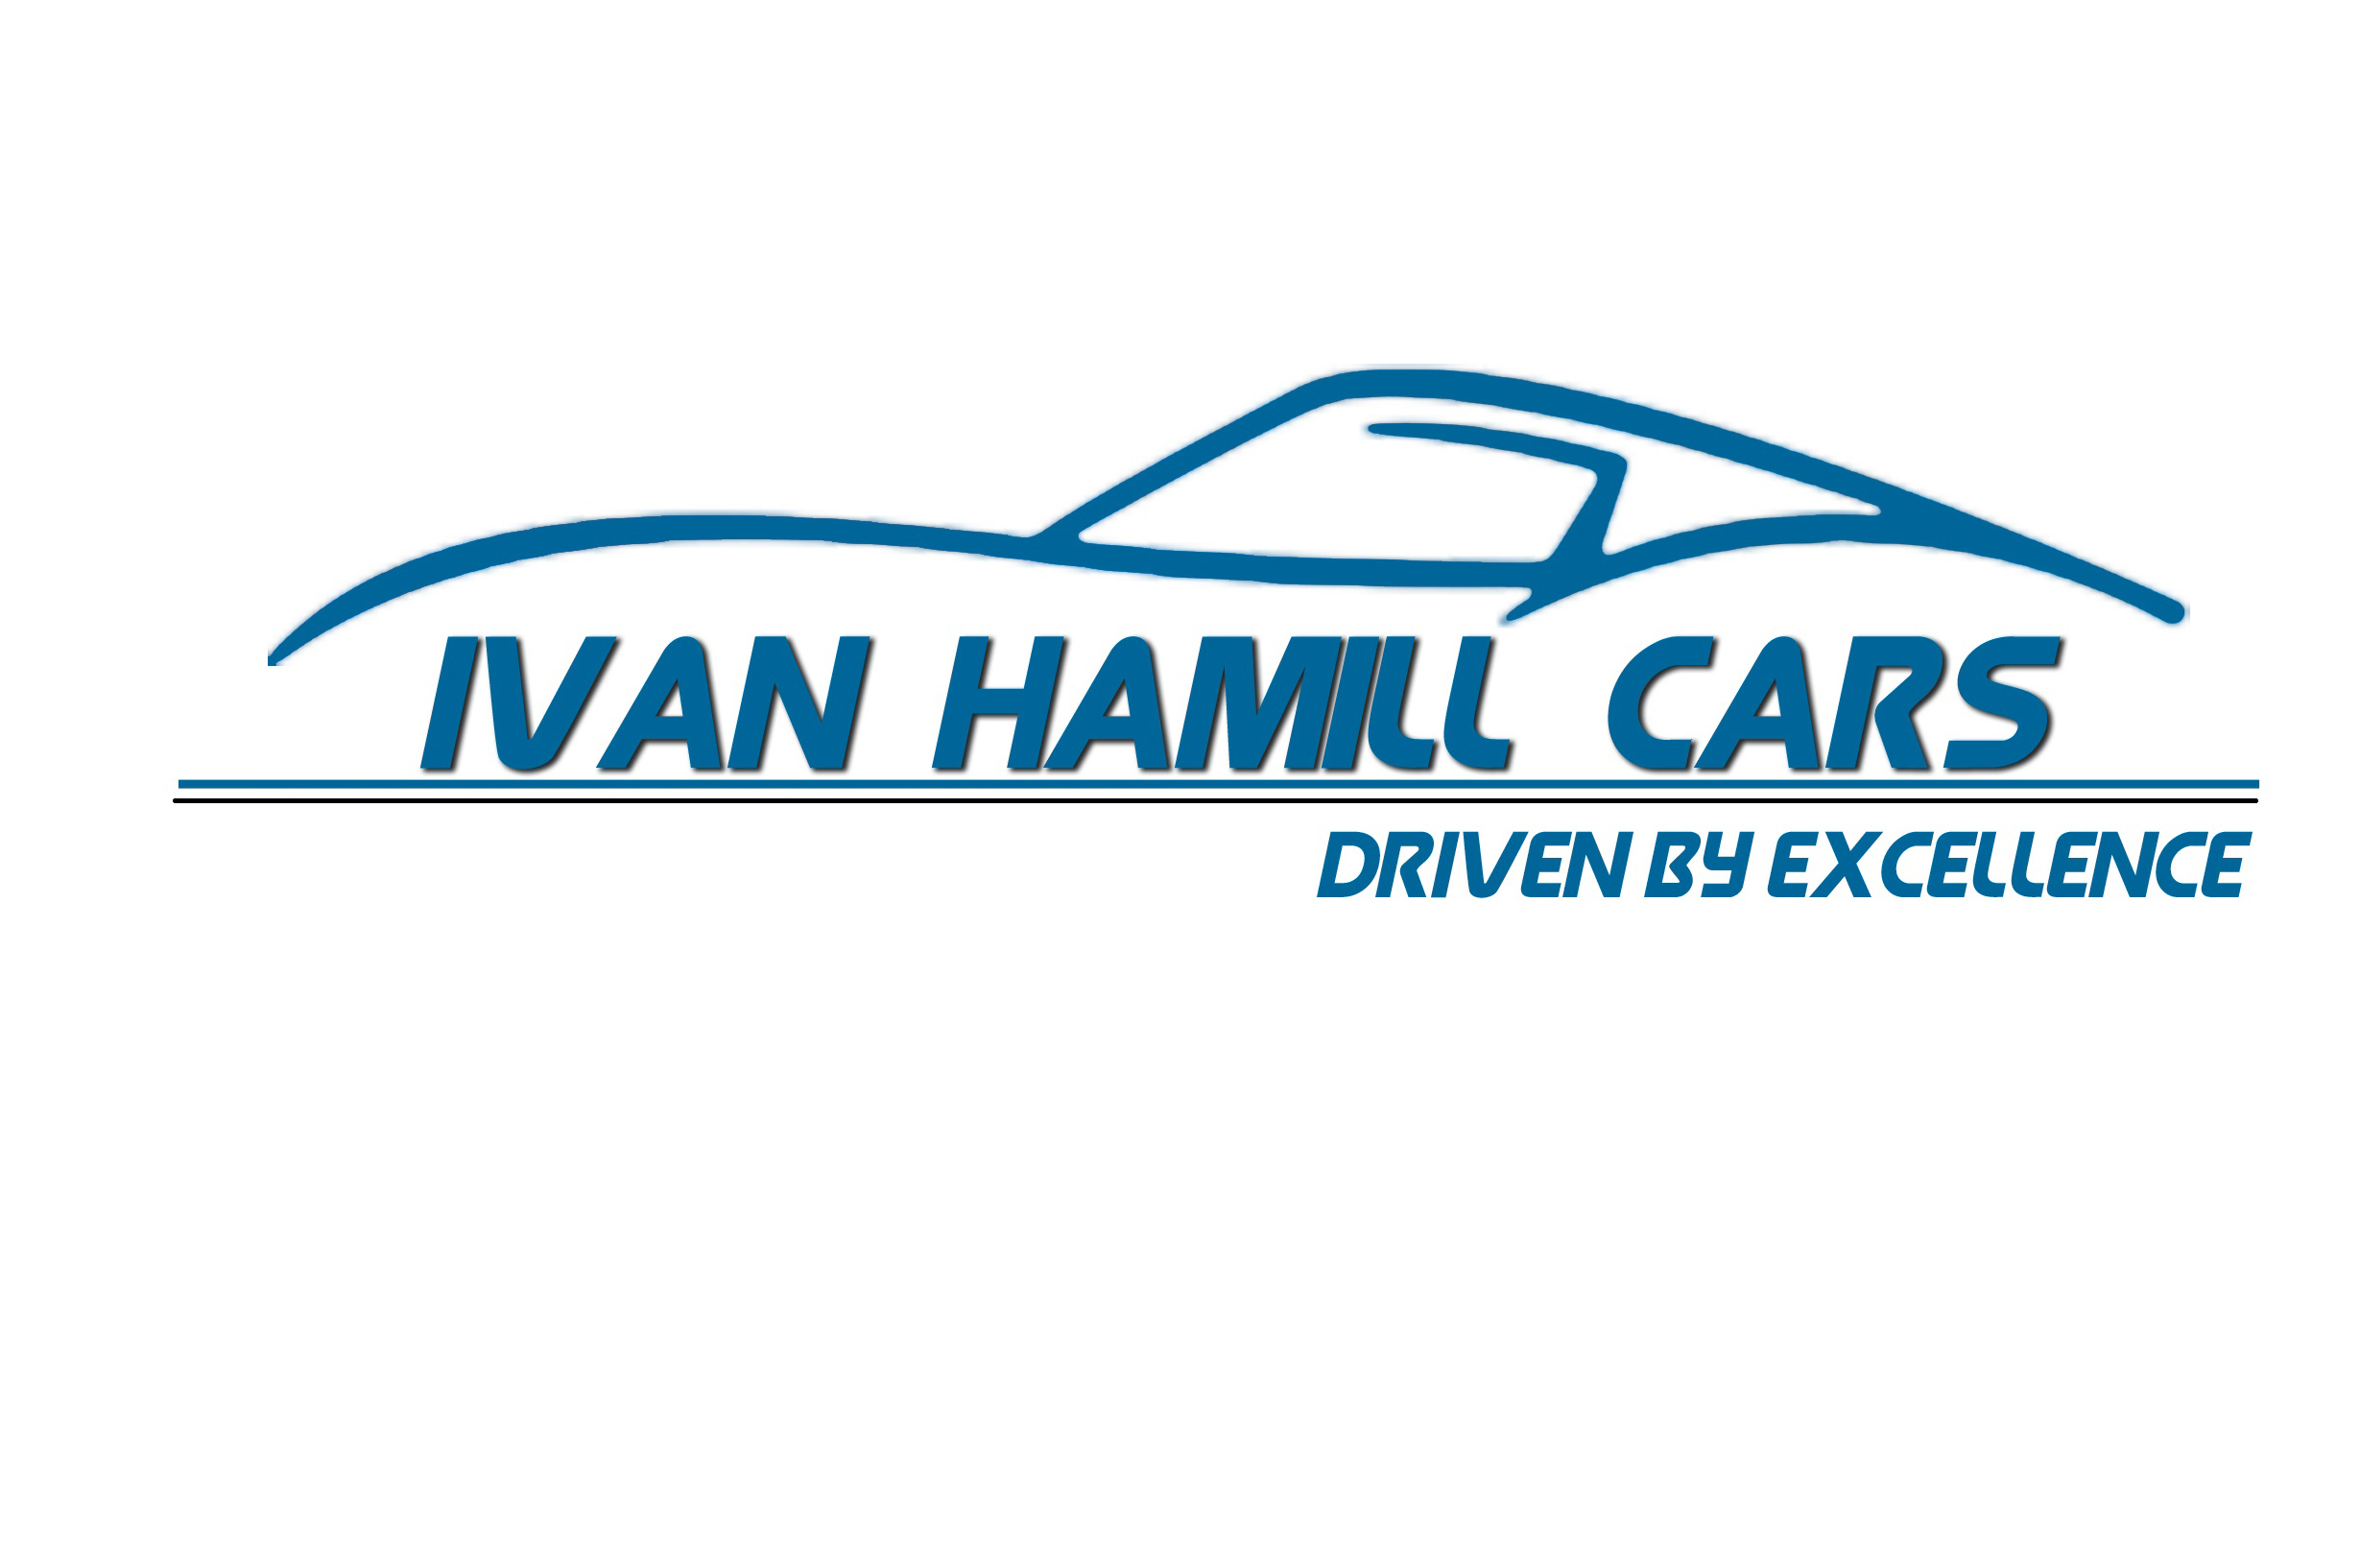 Ivan Hamill Cars, Portglenone